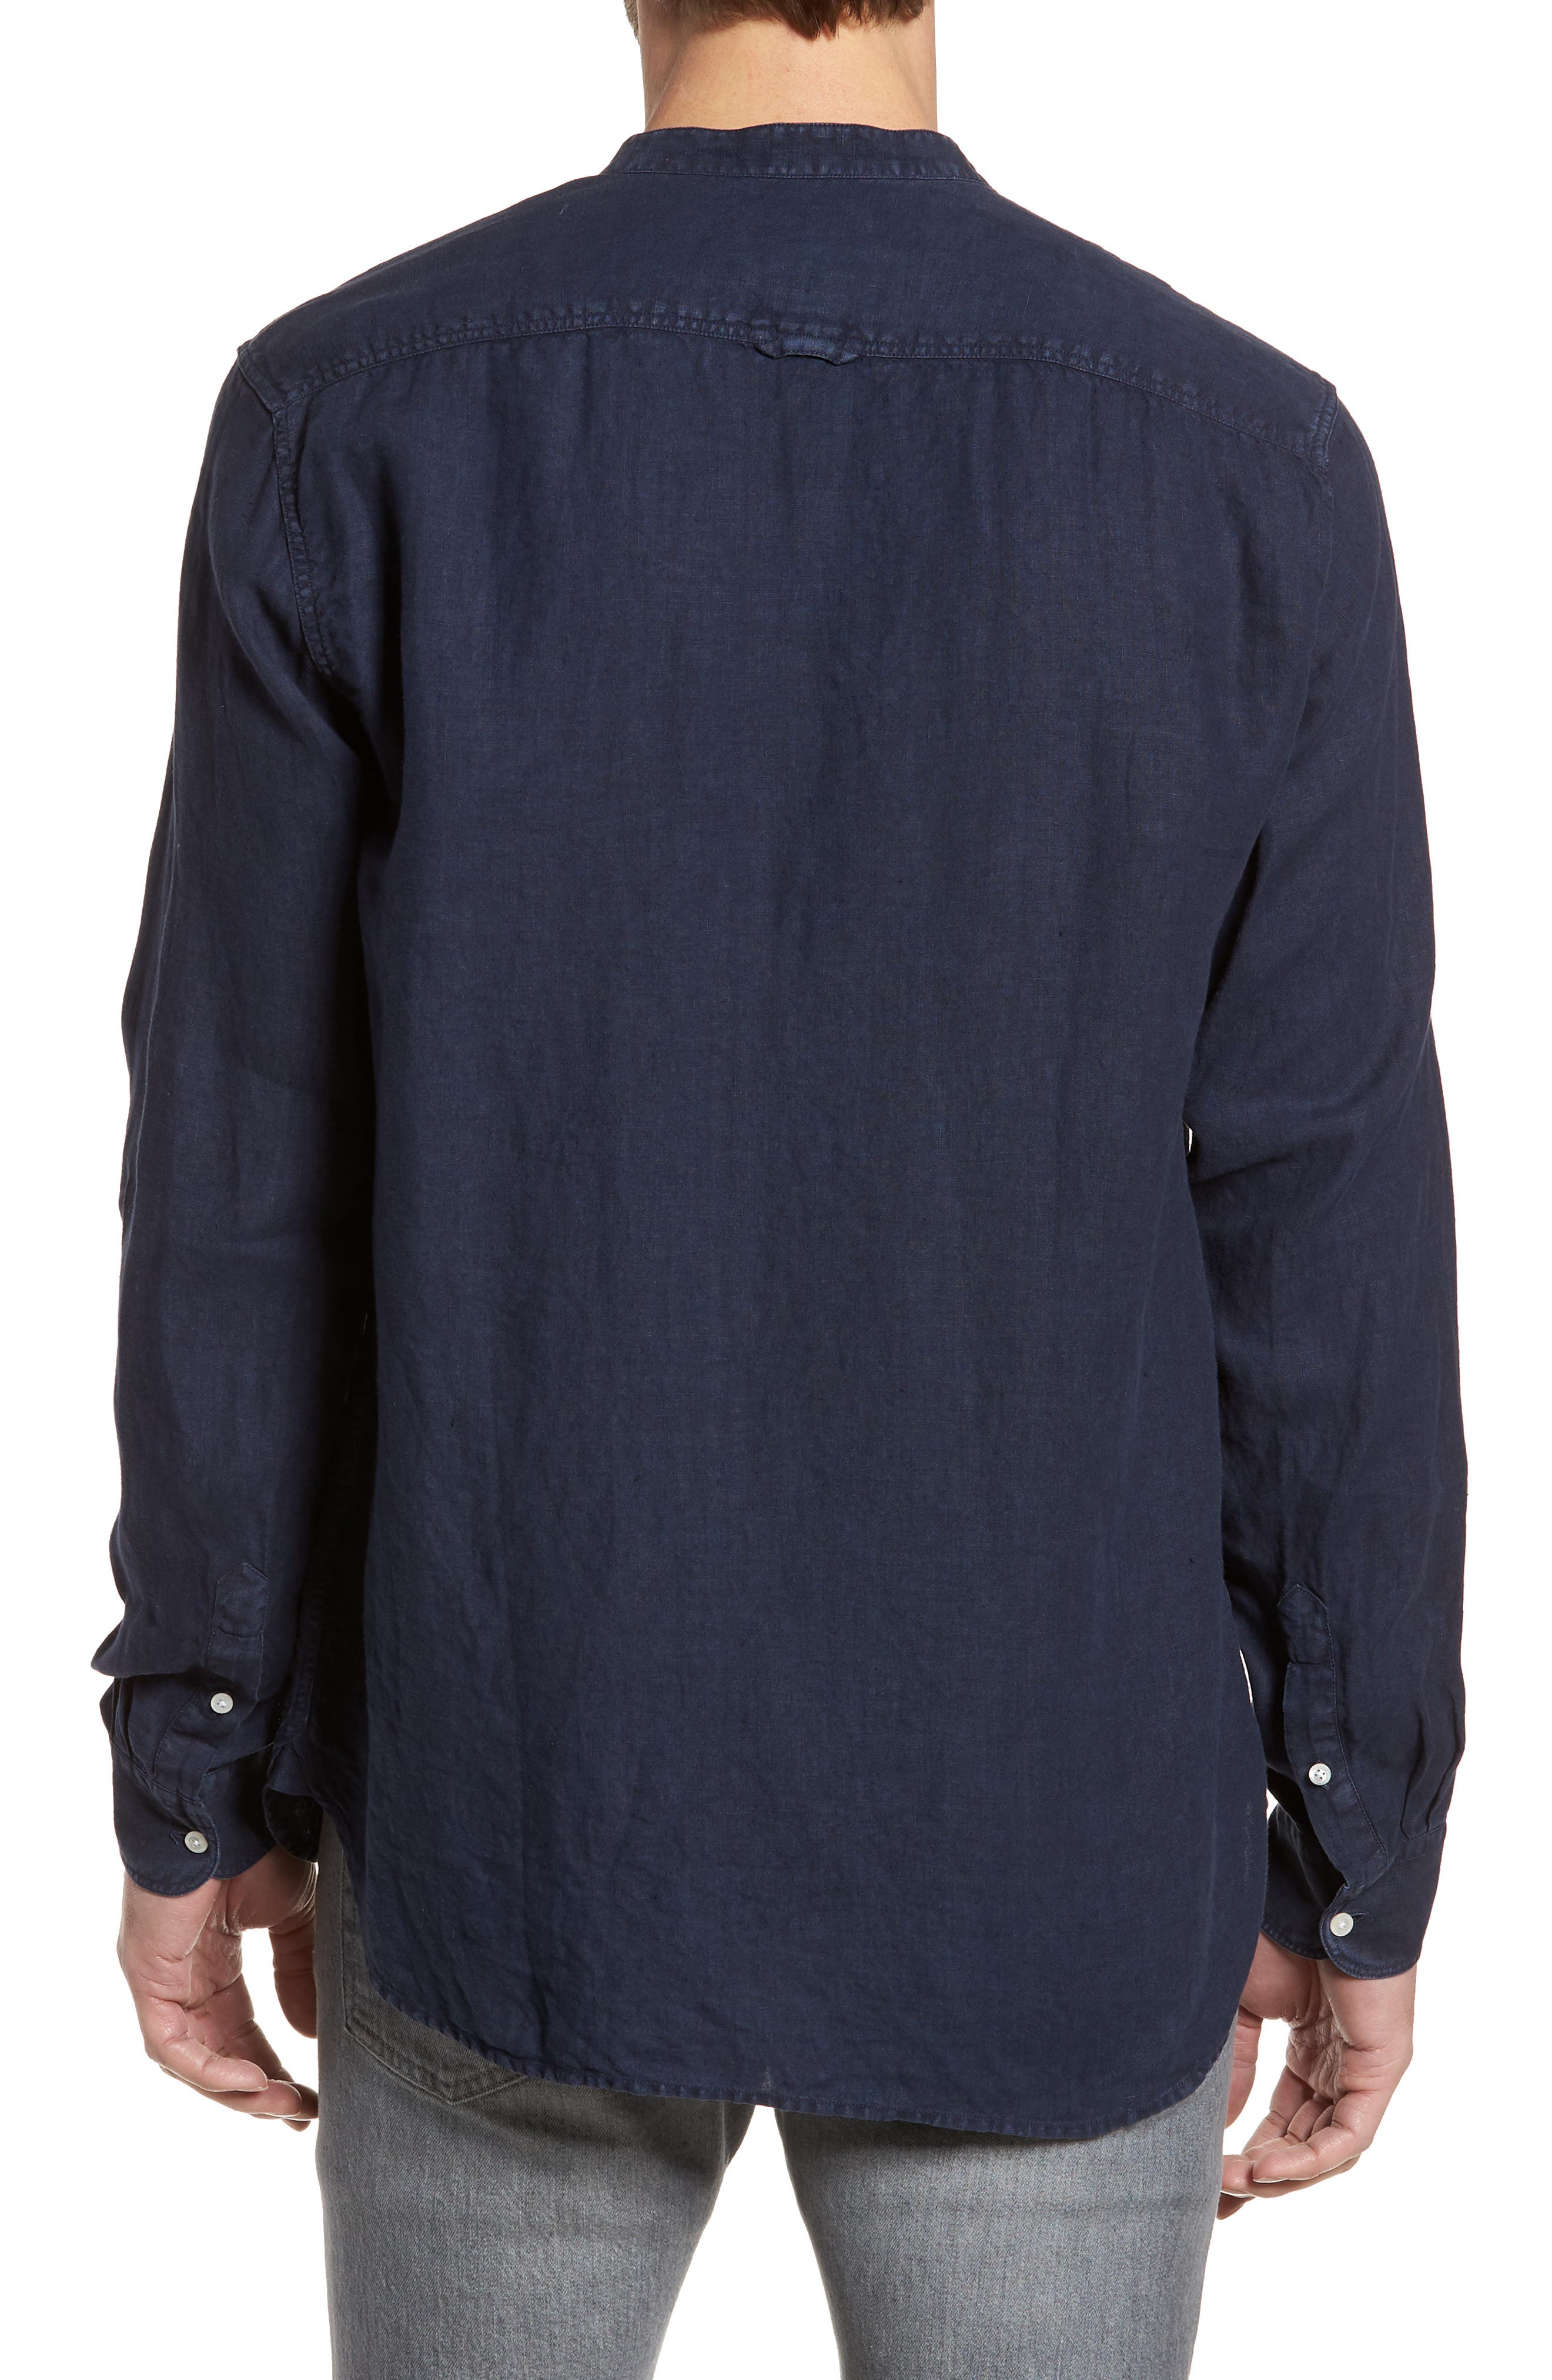 & Bros. Regular Fit Band Collar Linen Shirt,                             Alternate thumbnail 2, color,                             Mood Indigo